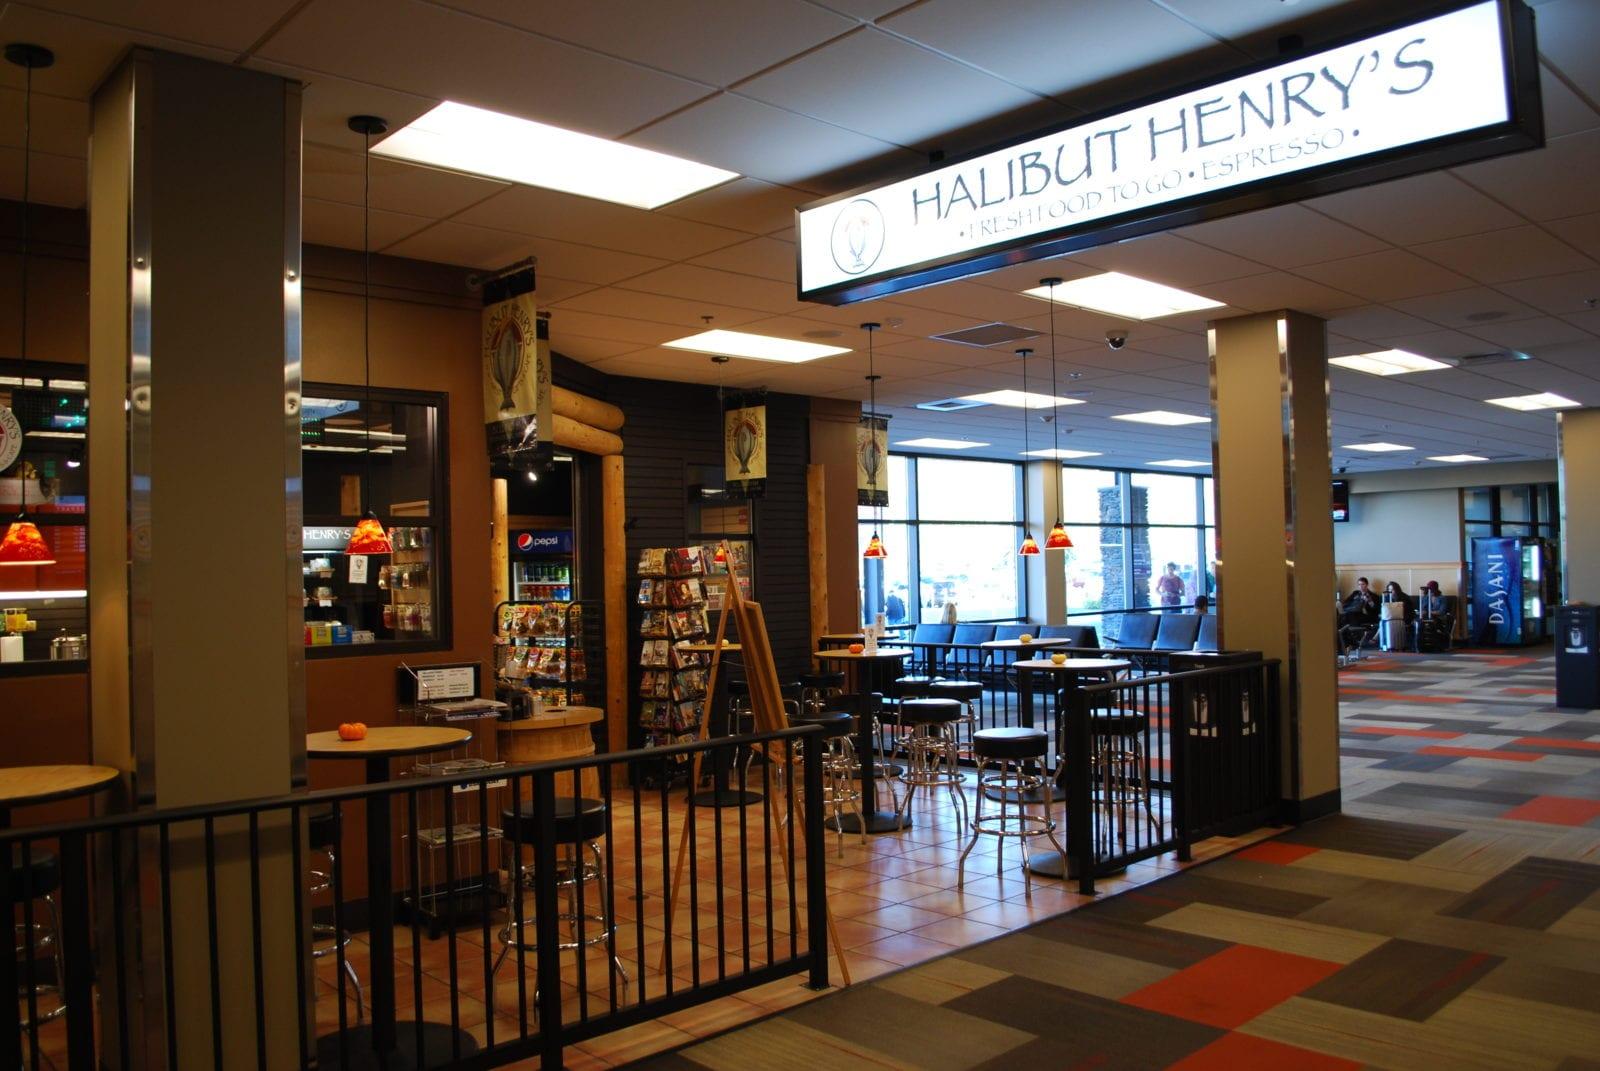 Bellingham Airport Interior Halibut Henry's 9